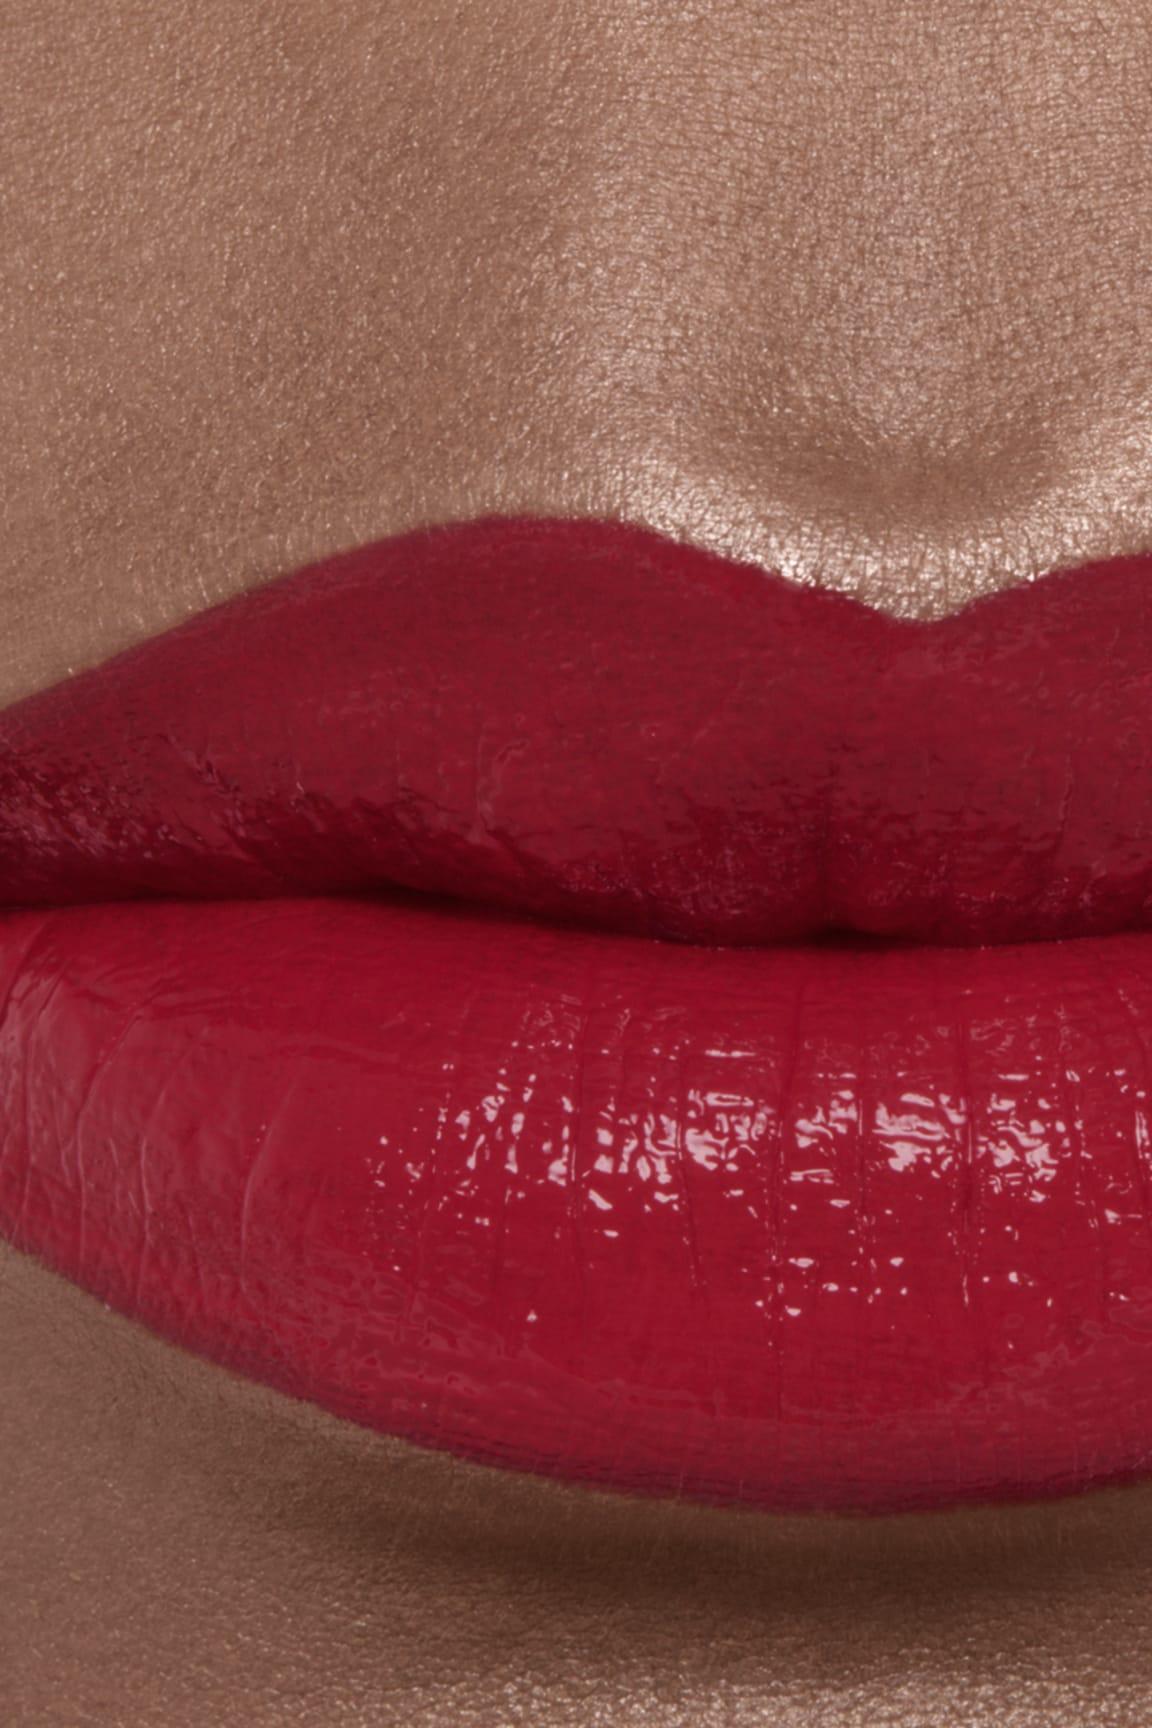 Anwendung Make-up-Bild 2 - ROUGE COCO BLOOM 138 - VITALITÉ